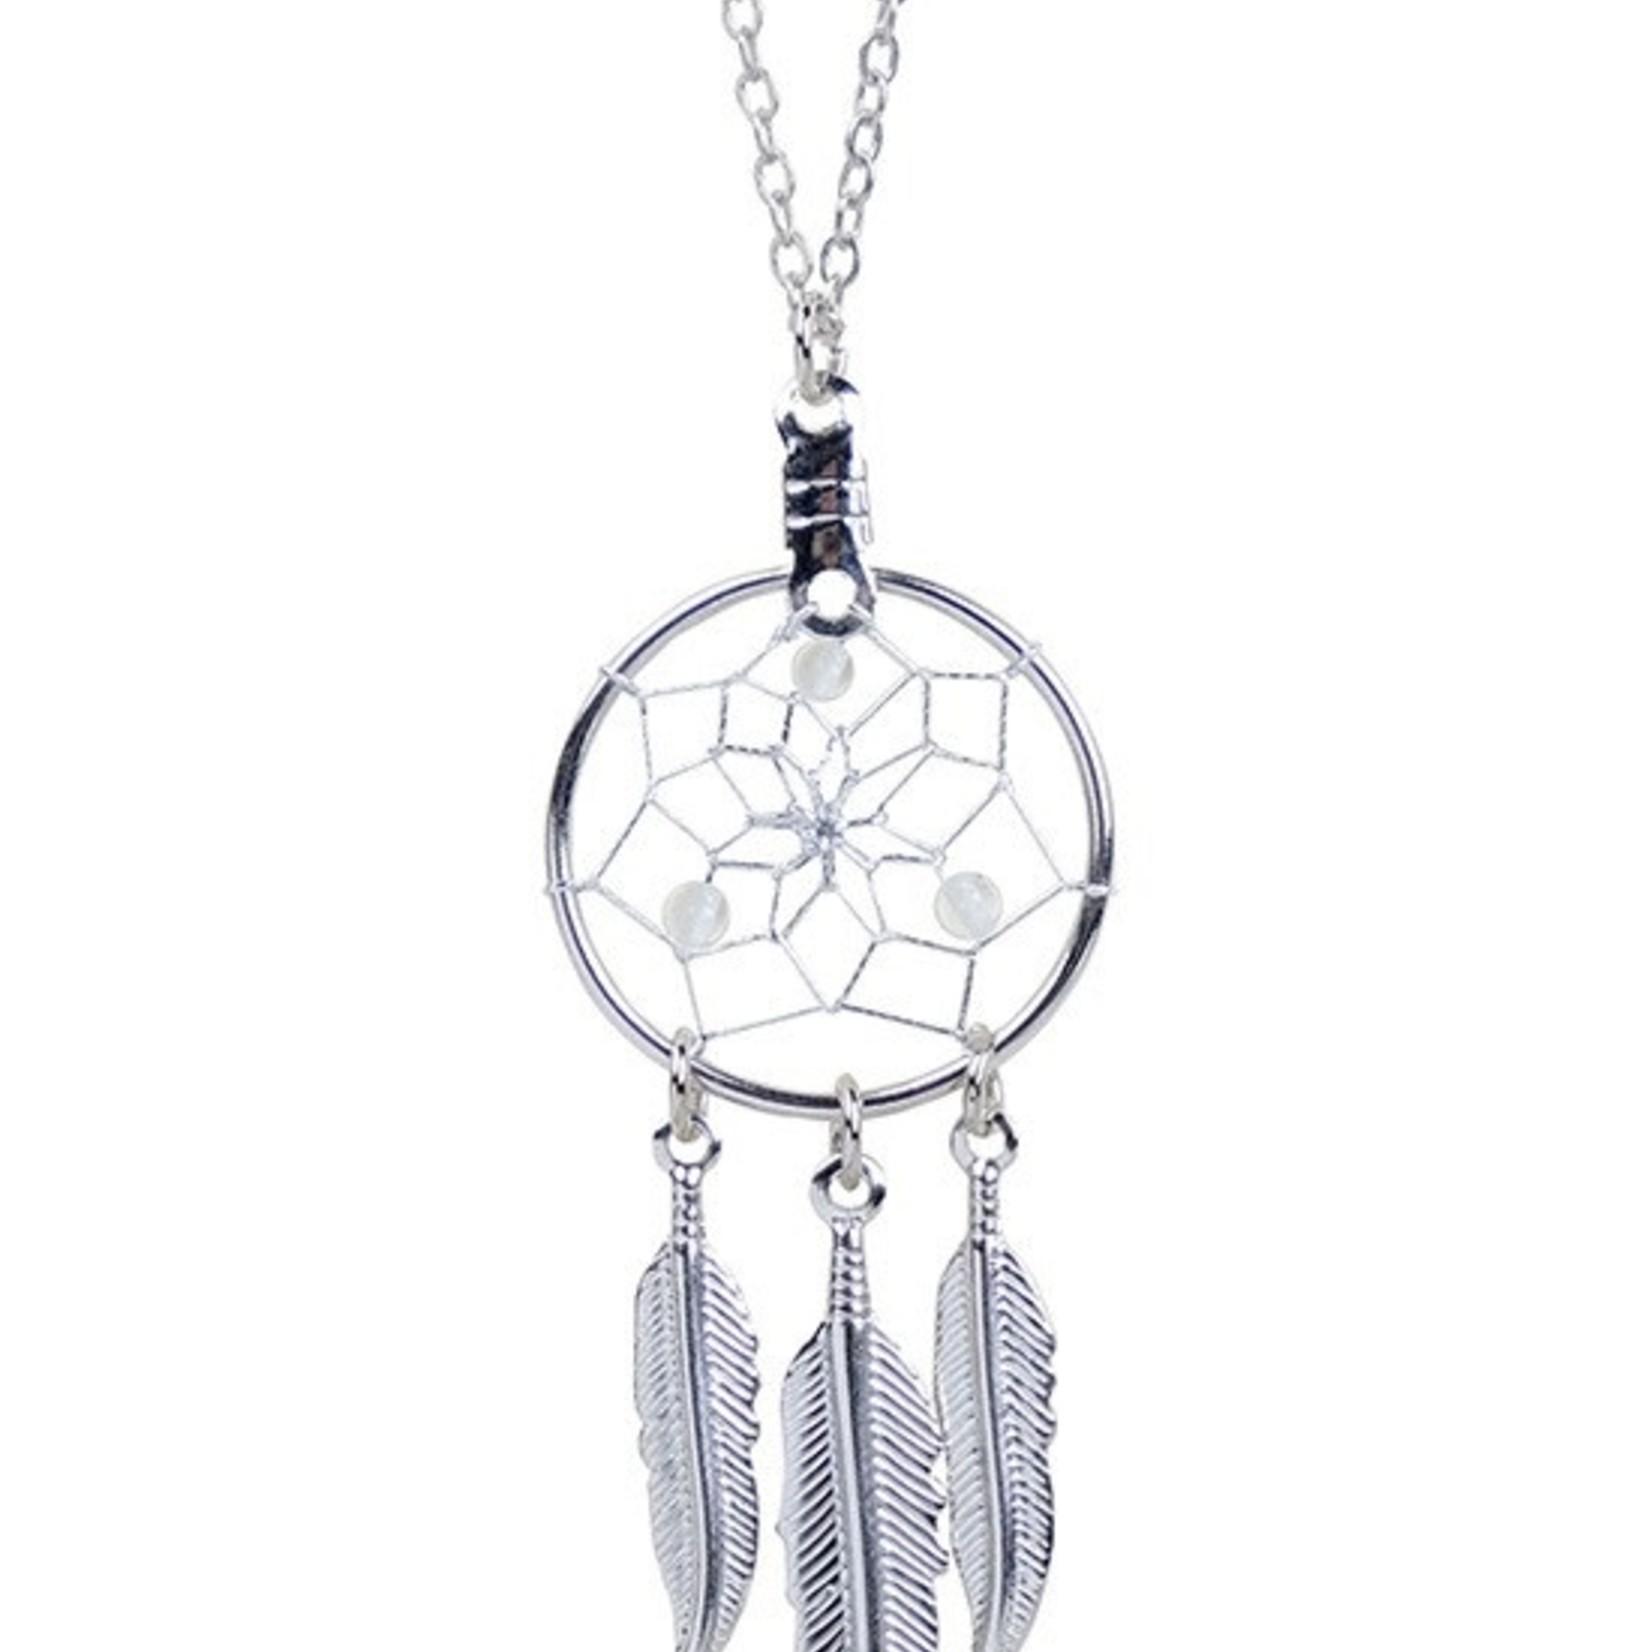 April Dreamcatcher Birthstone Necklace